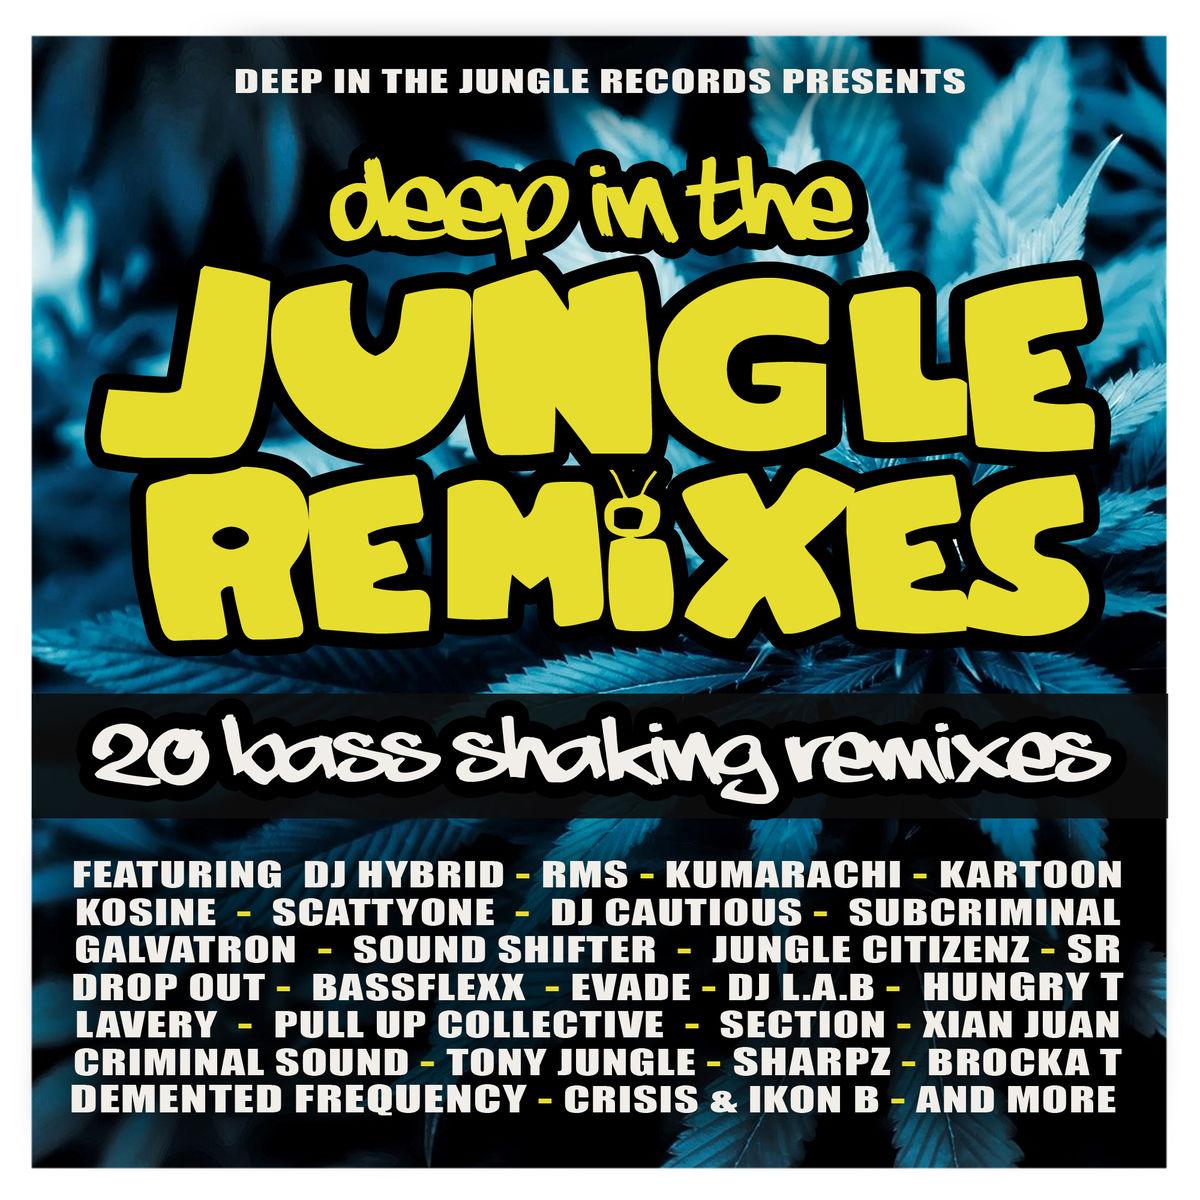 Hungry T - Babilonya Dub (Subcriminal Remix)